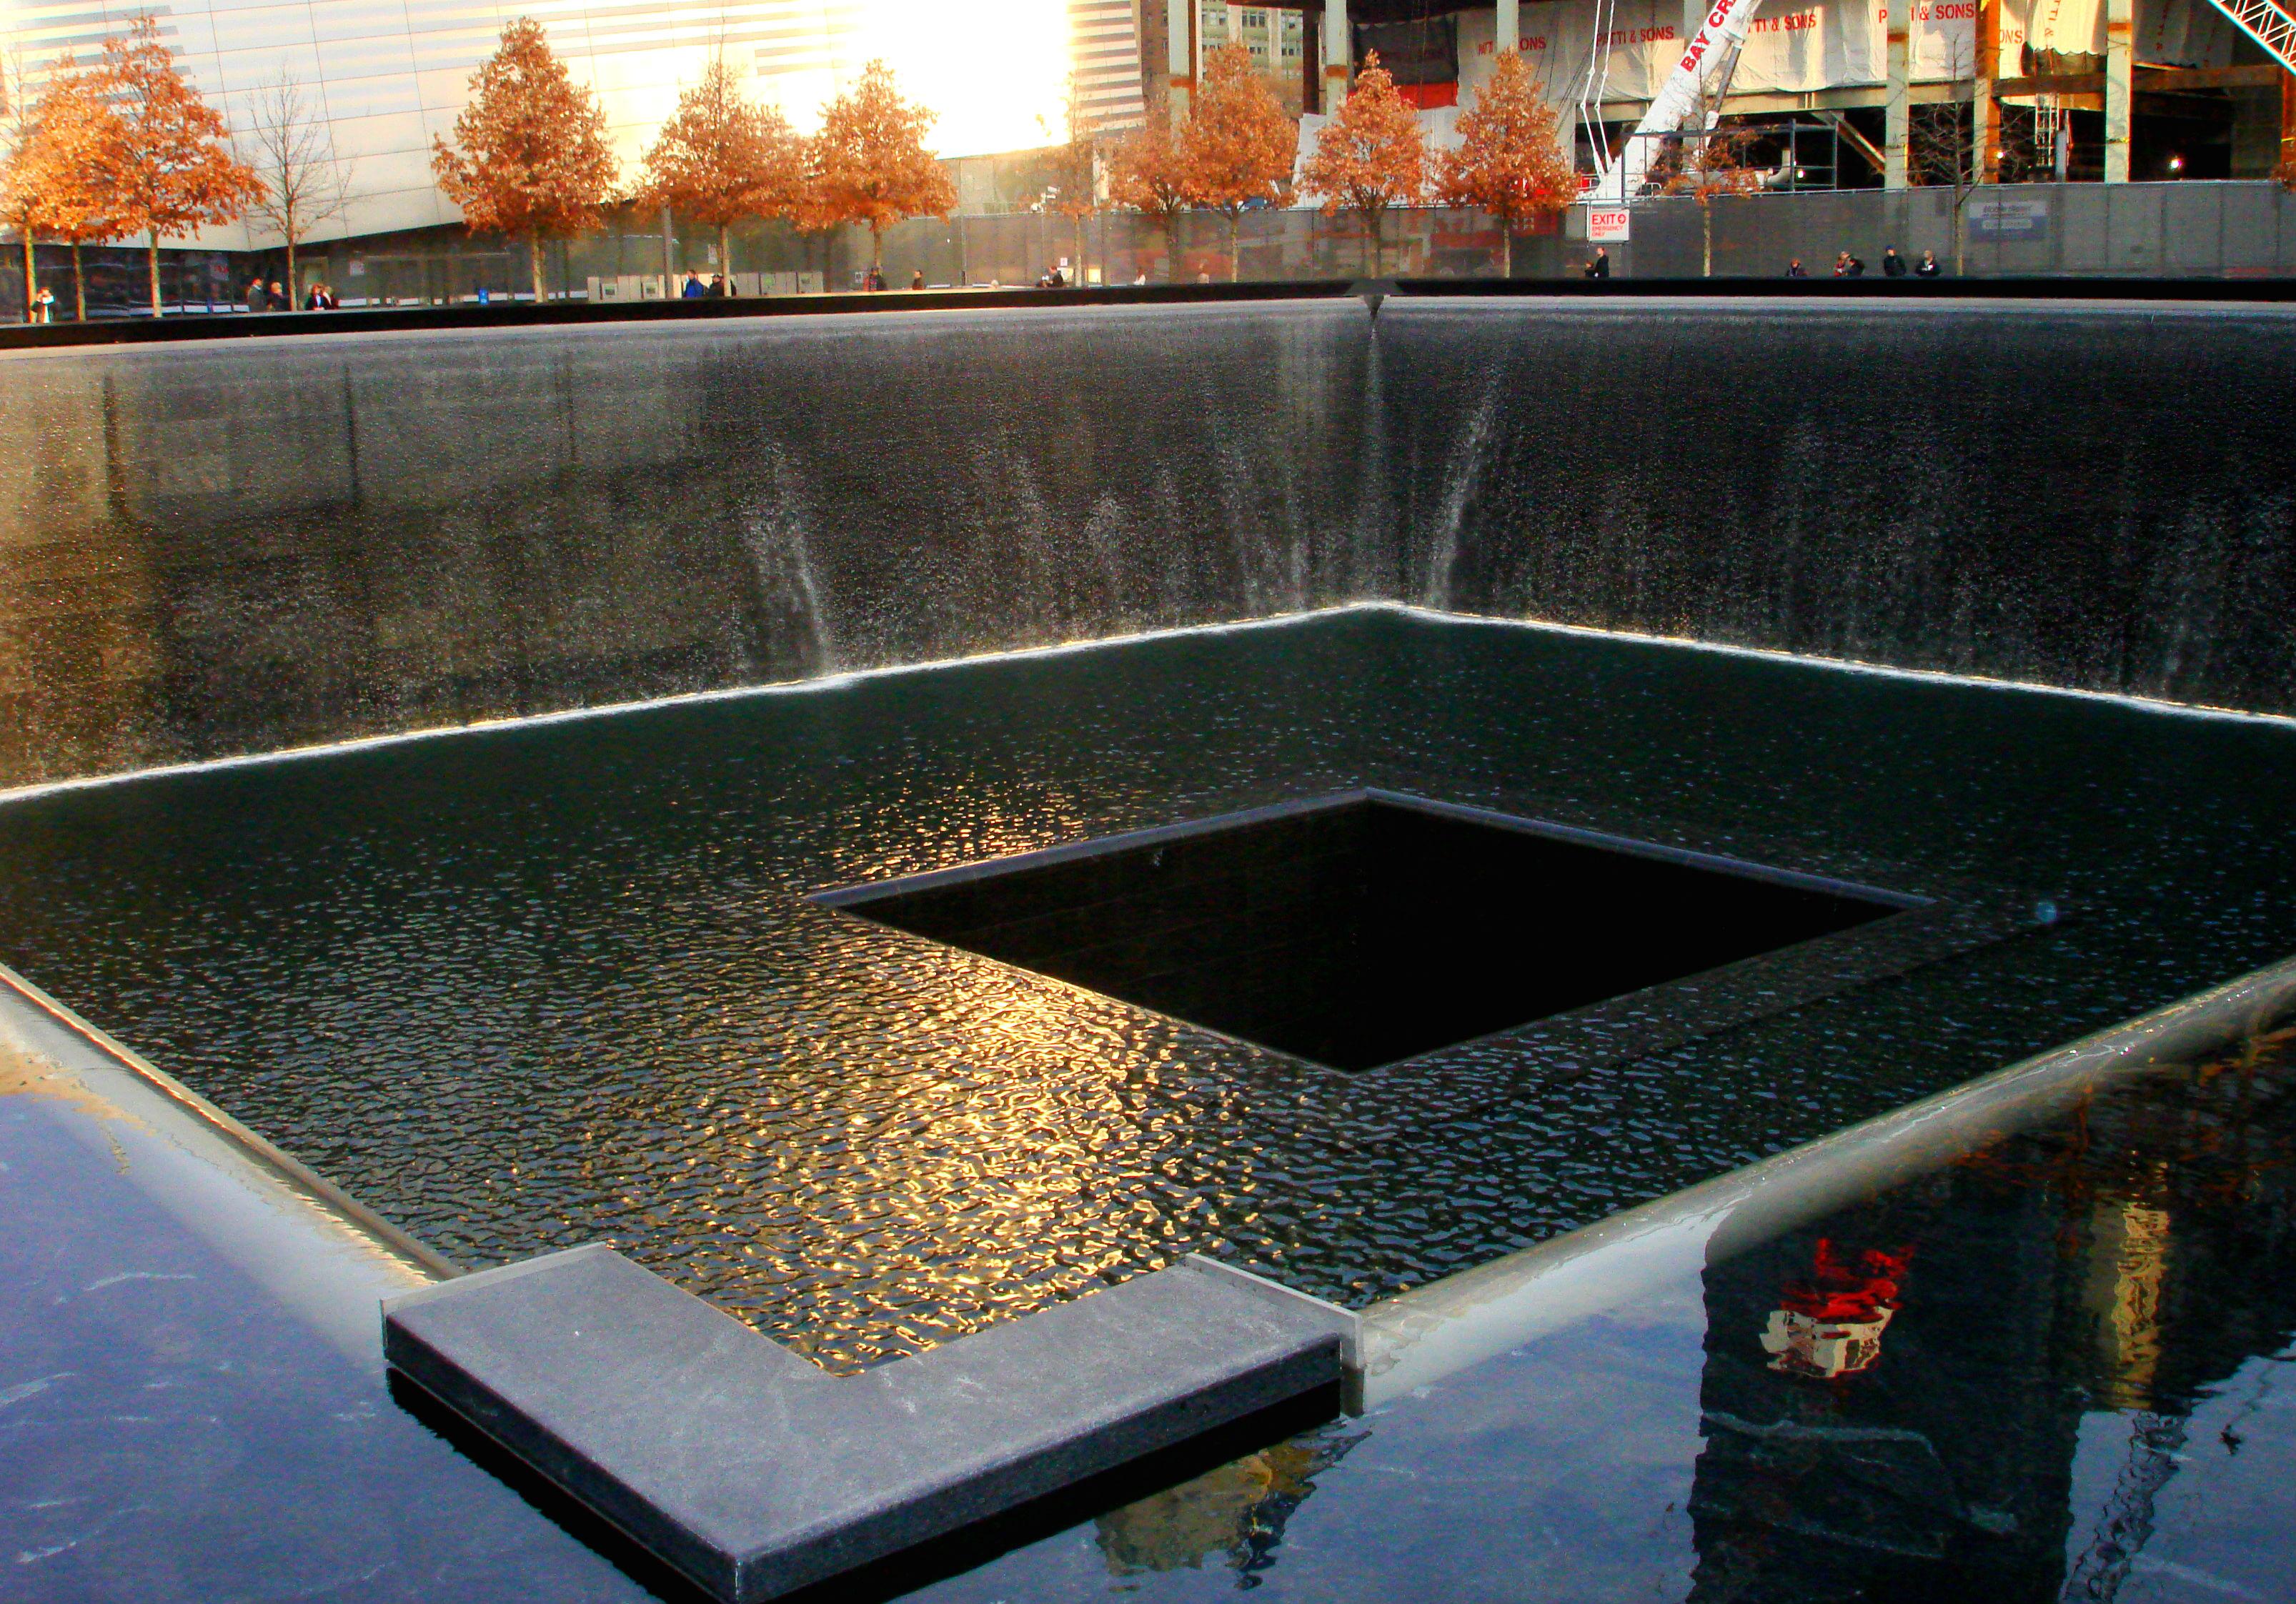 Budget luxury this christmas in new york - Ground zero pools ...